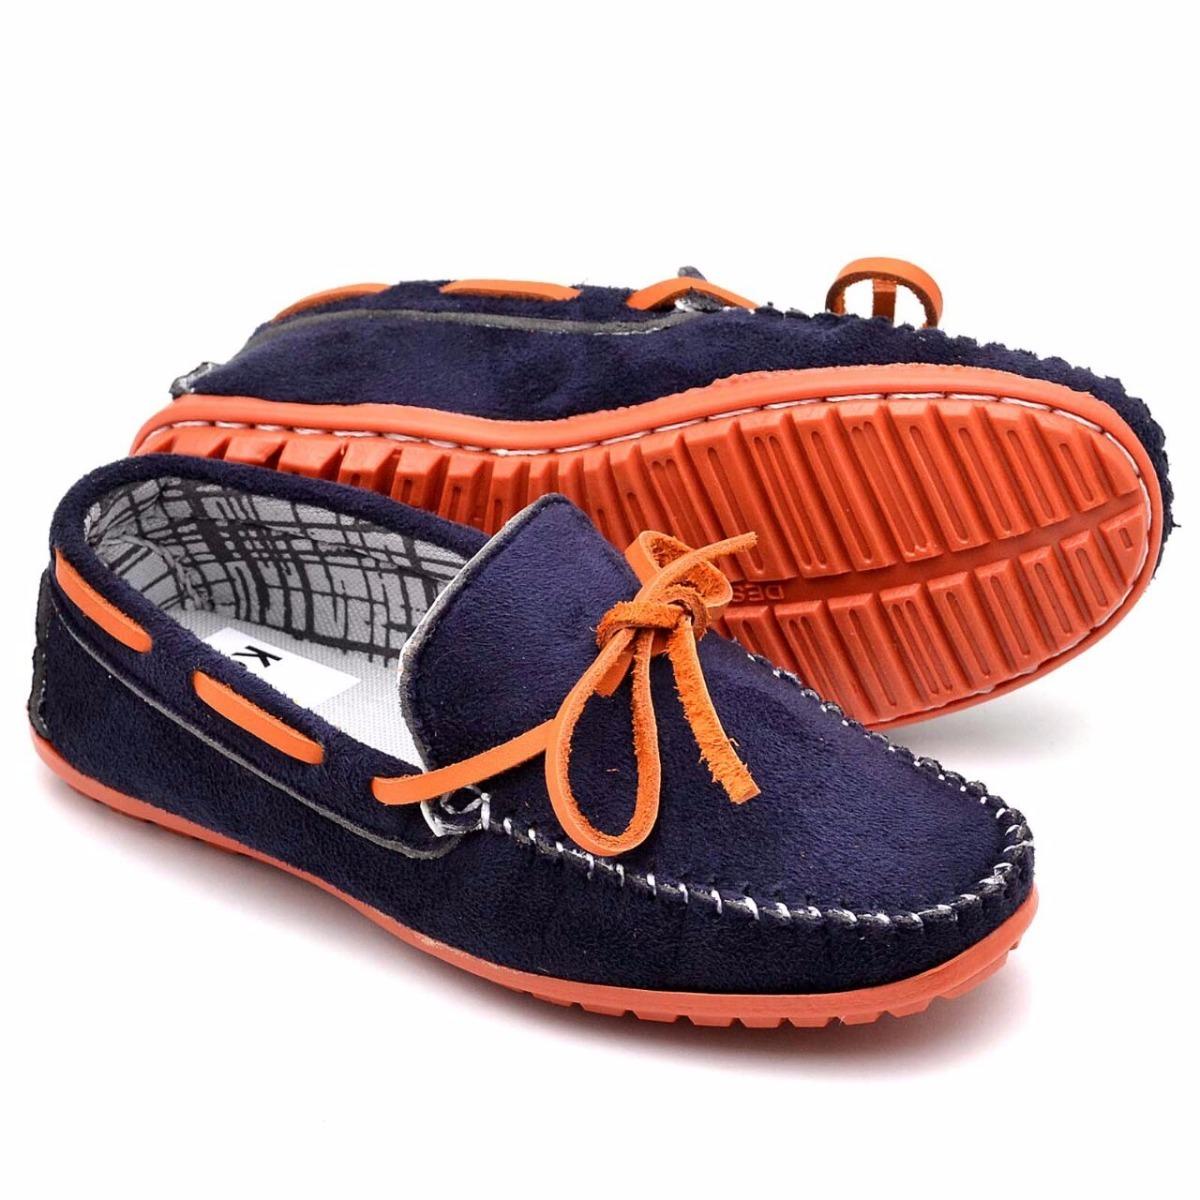 34c5db0cc2 sapato mocassim masculino infantil esporte kid junior. Carregando zoom.